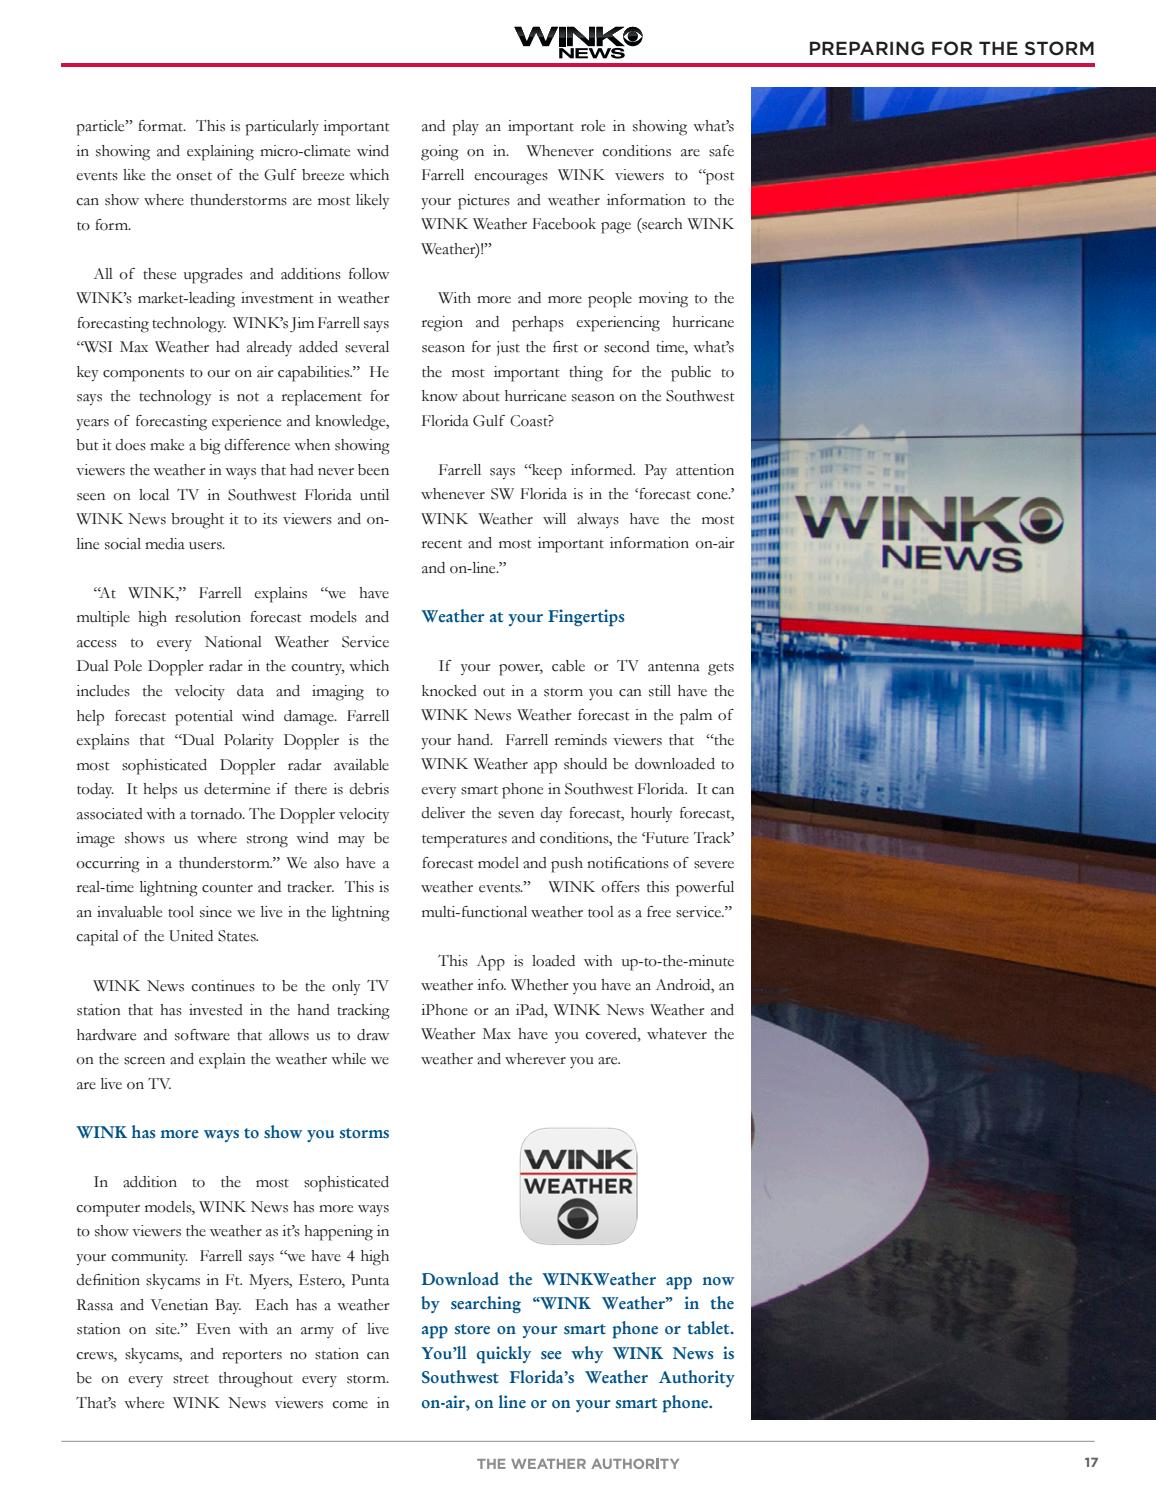 2016 WINK News Hurricane Guide by Wink - issuu